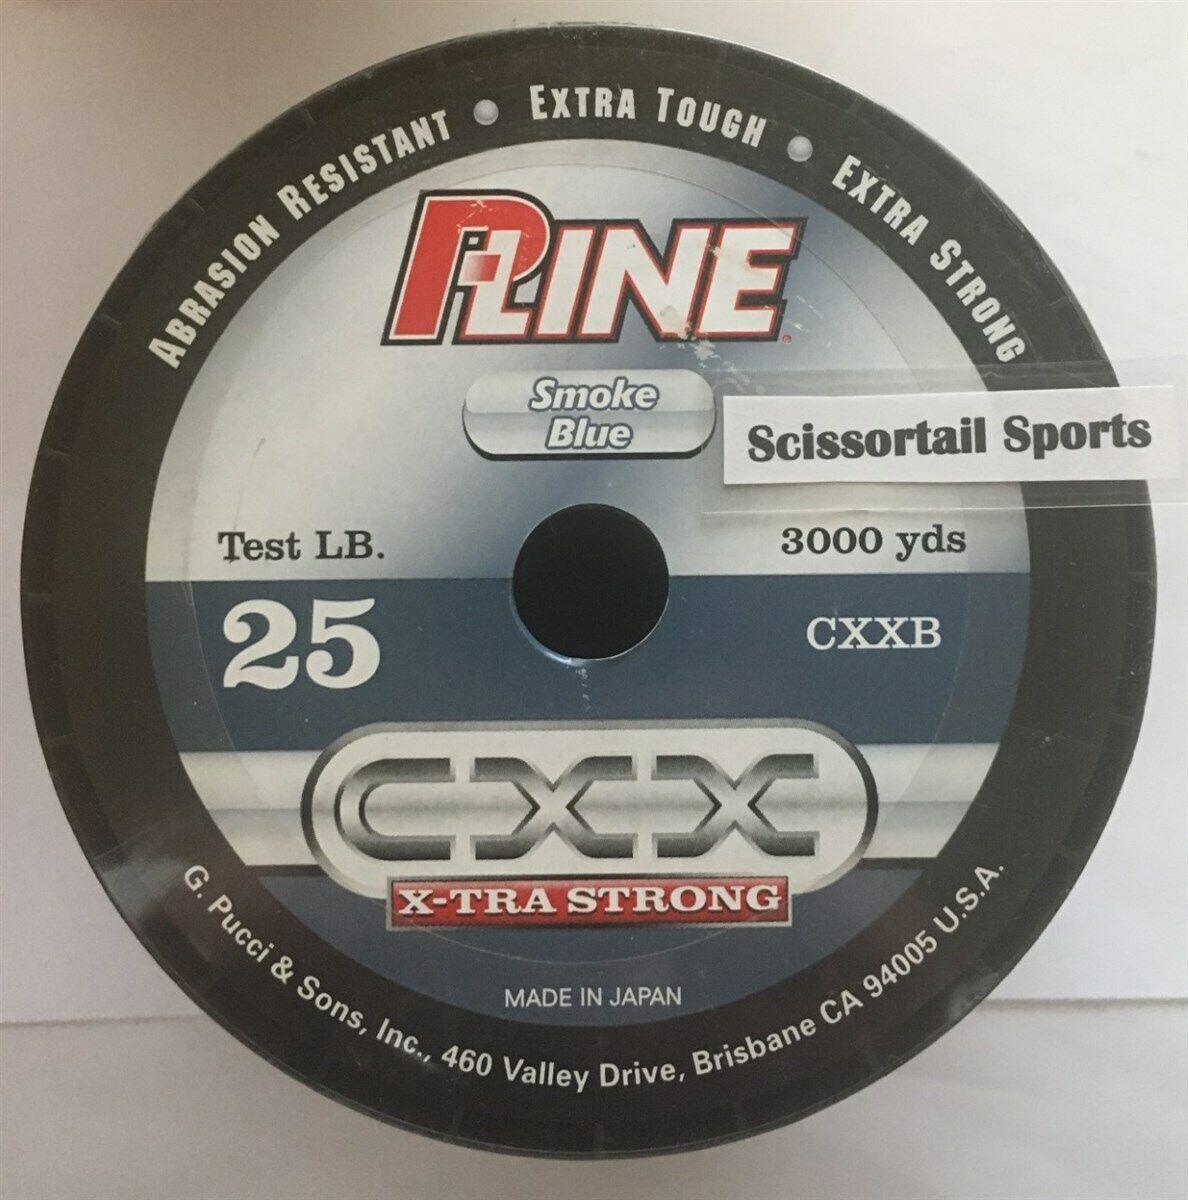 P-Line CXX X-TRA Strong 25 lb 3000 yd Fishing Line Smoke bluee, NEW